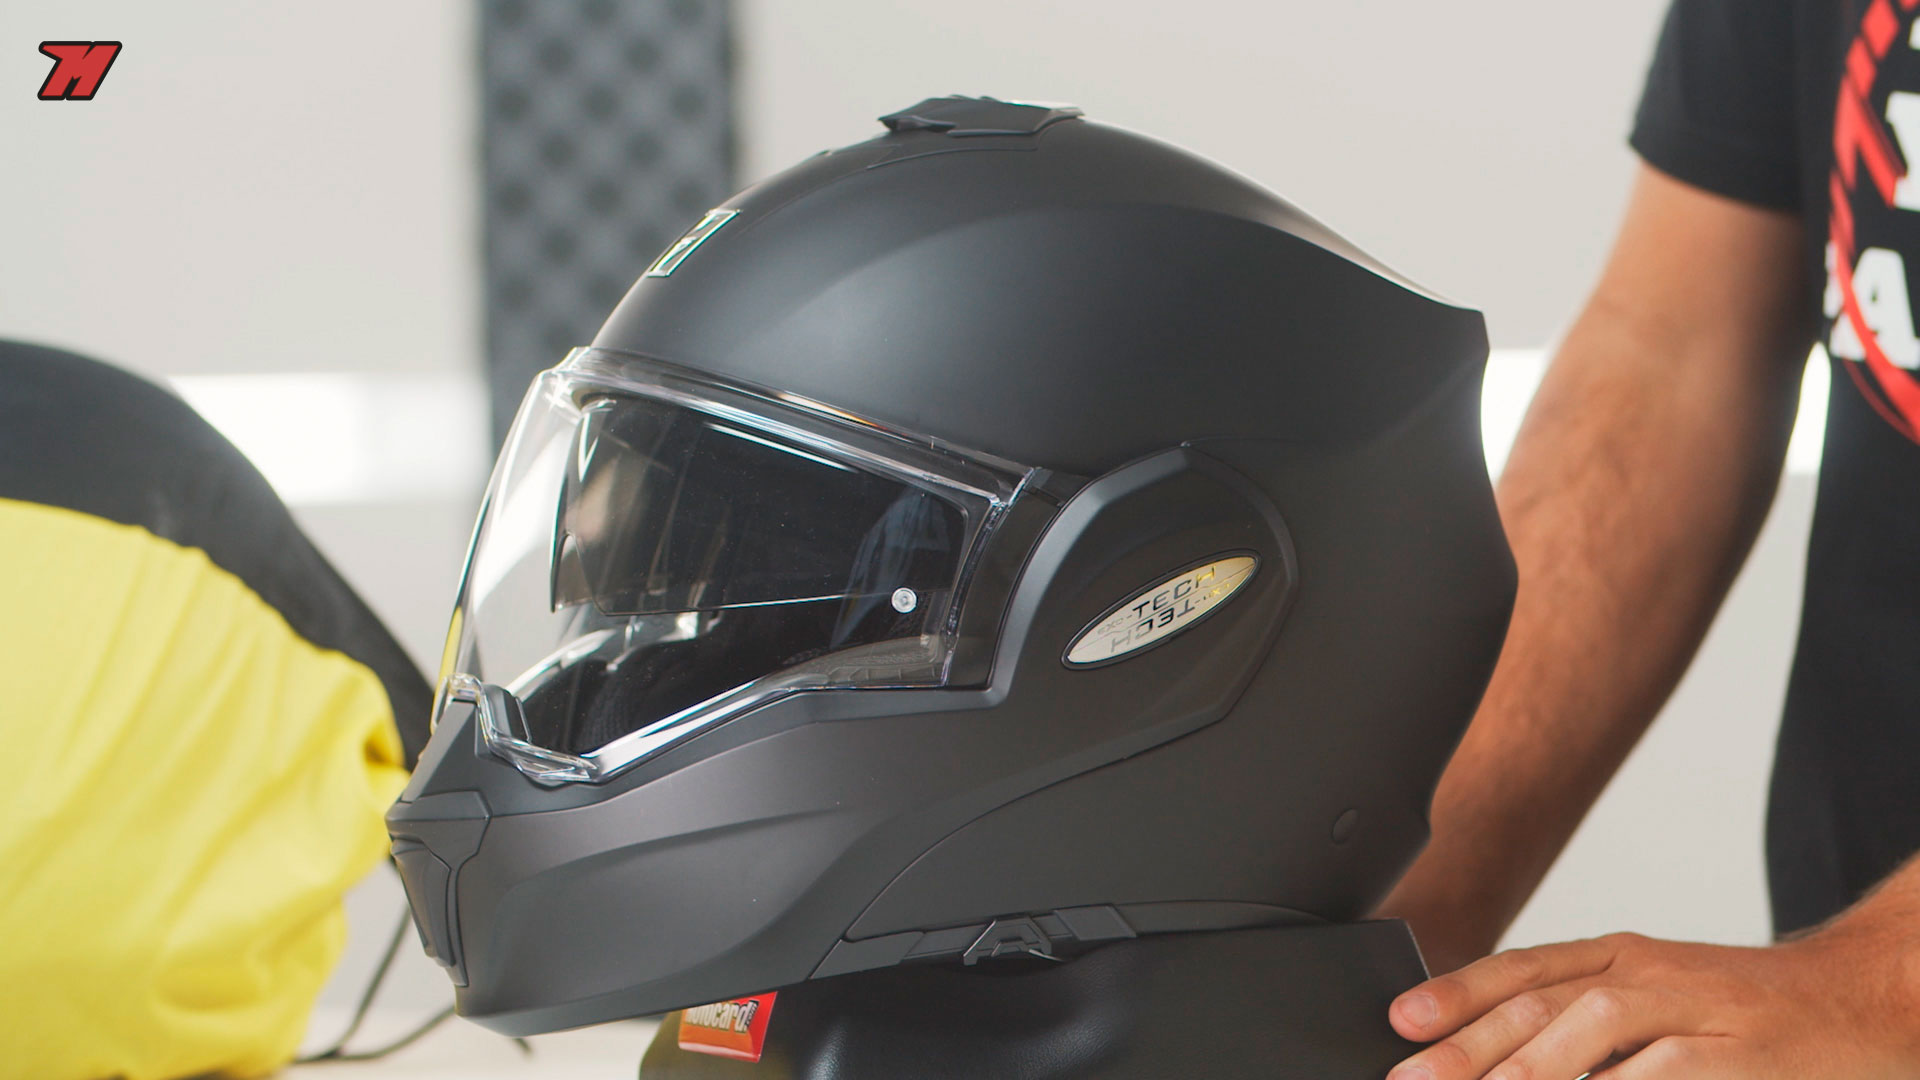 Review Scorpion Exo Tech The New Best Selling Modular Helmet